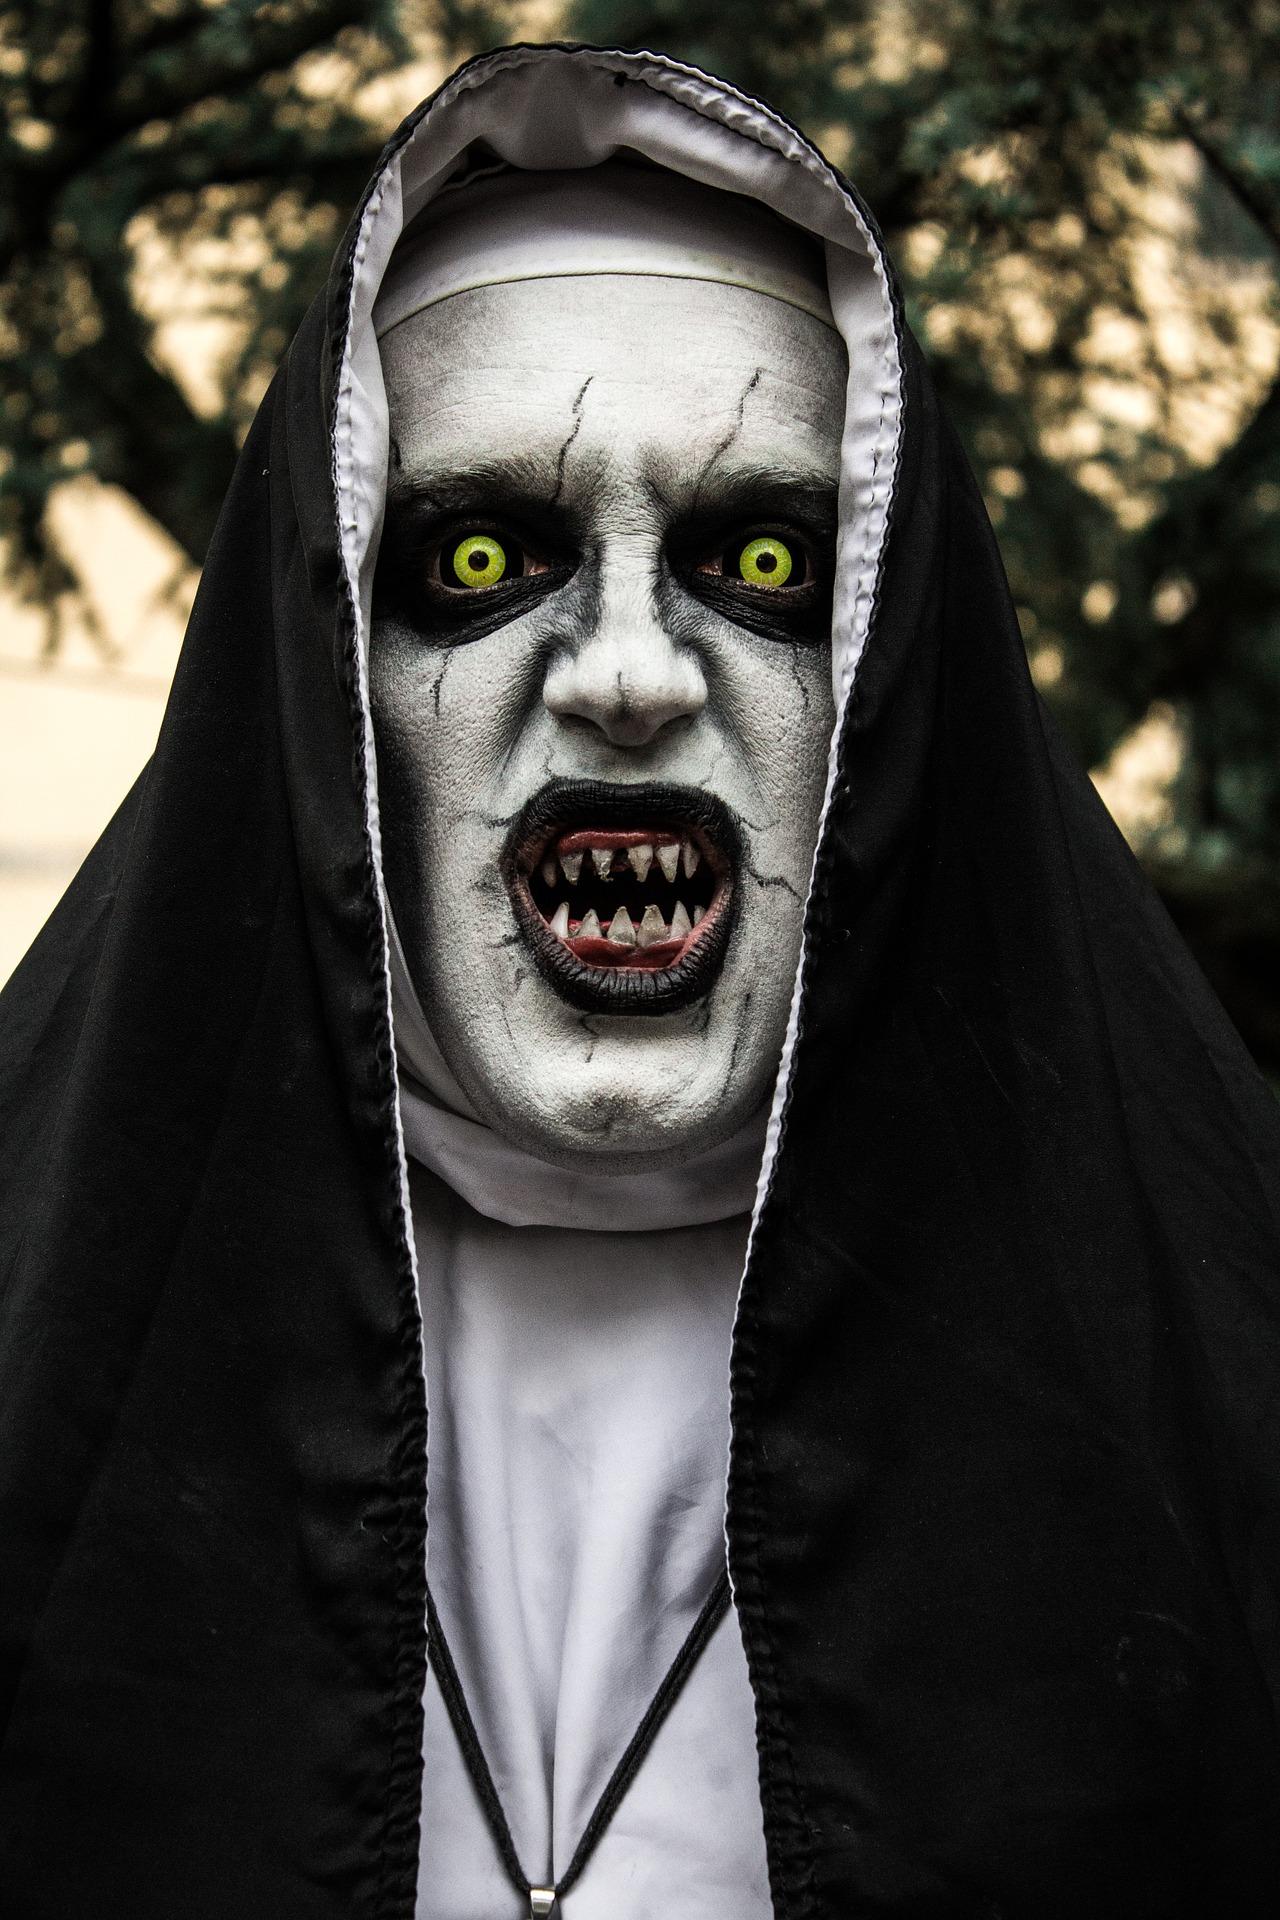 the-nun-3796613_1920.jpg